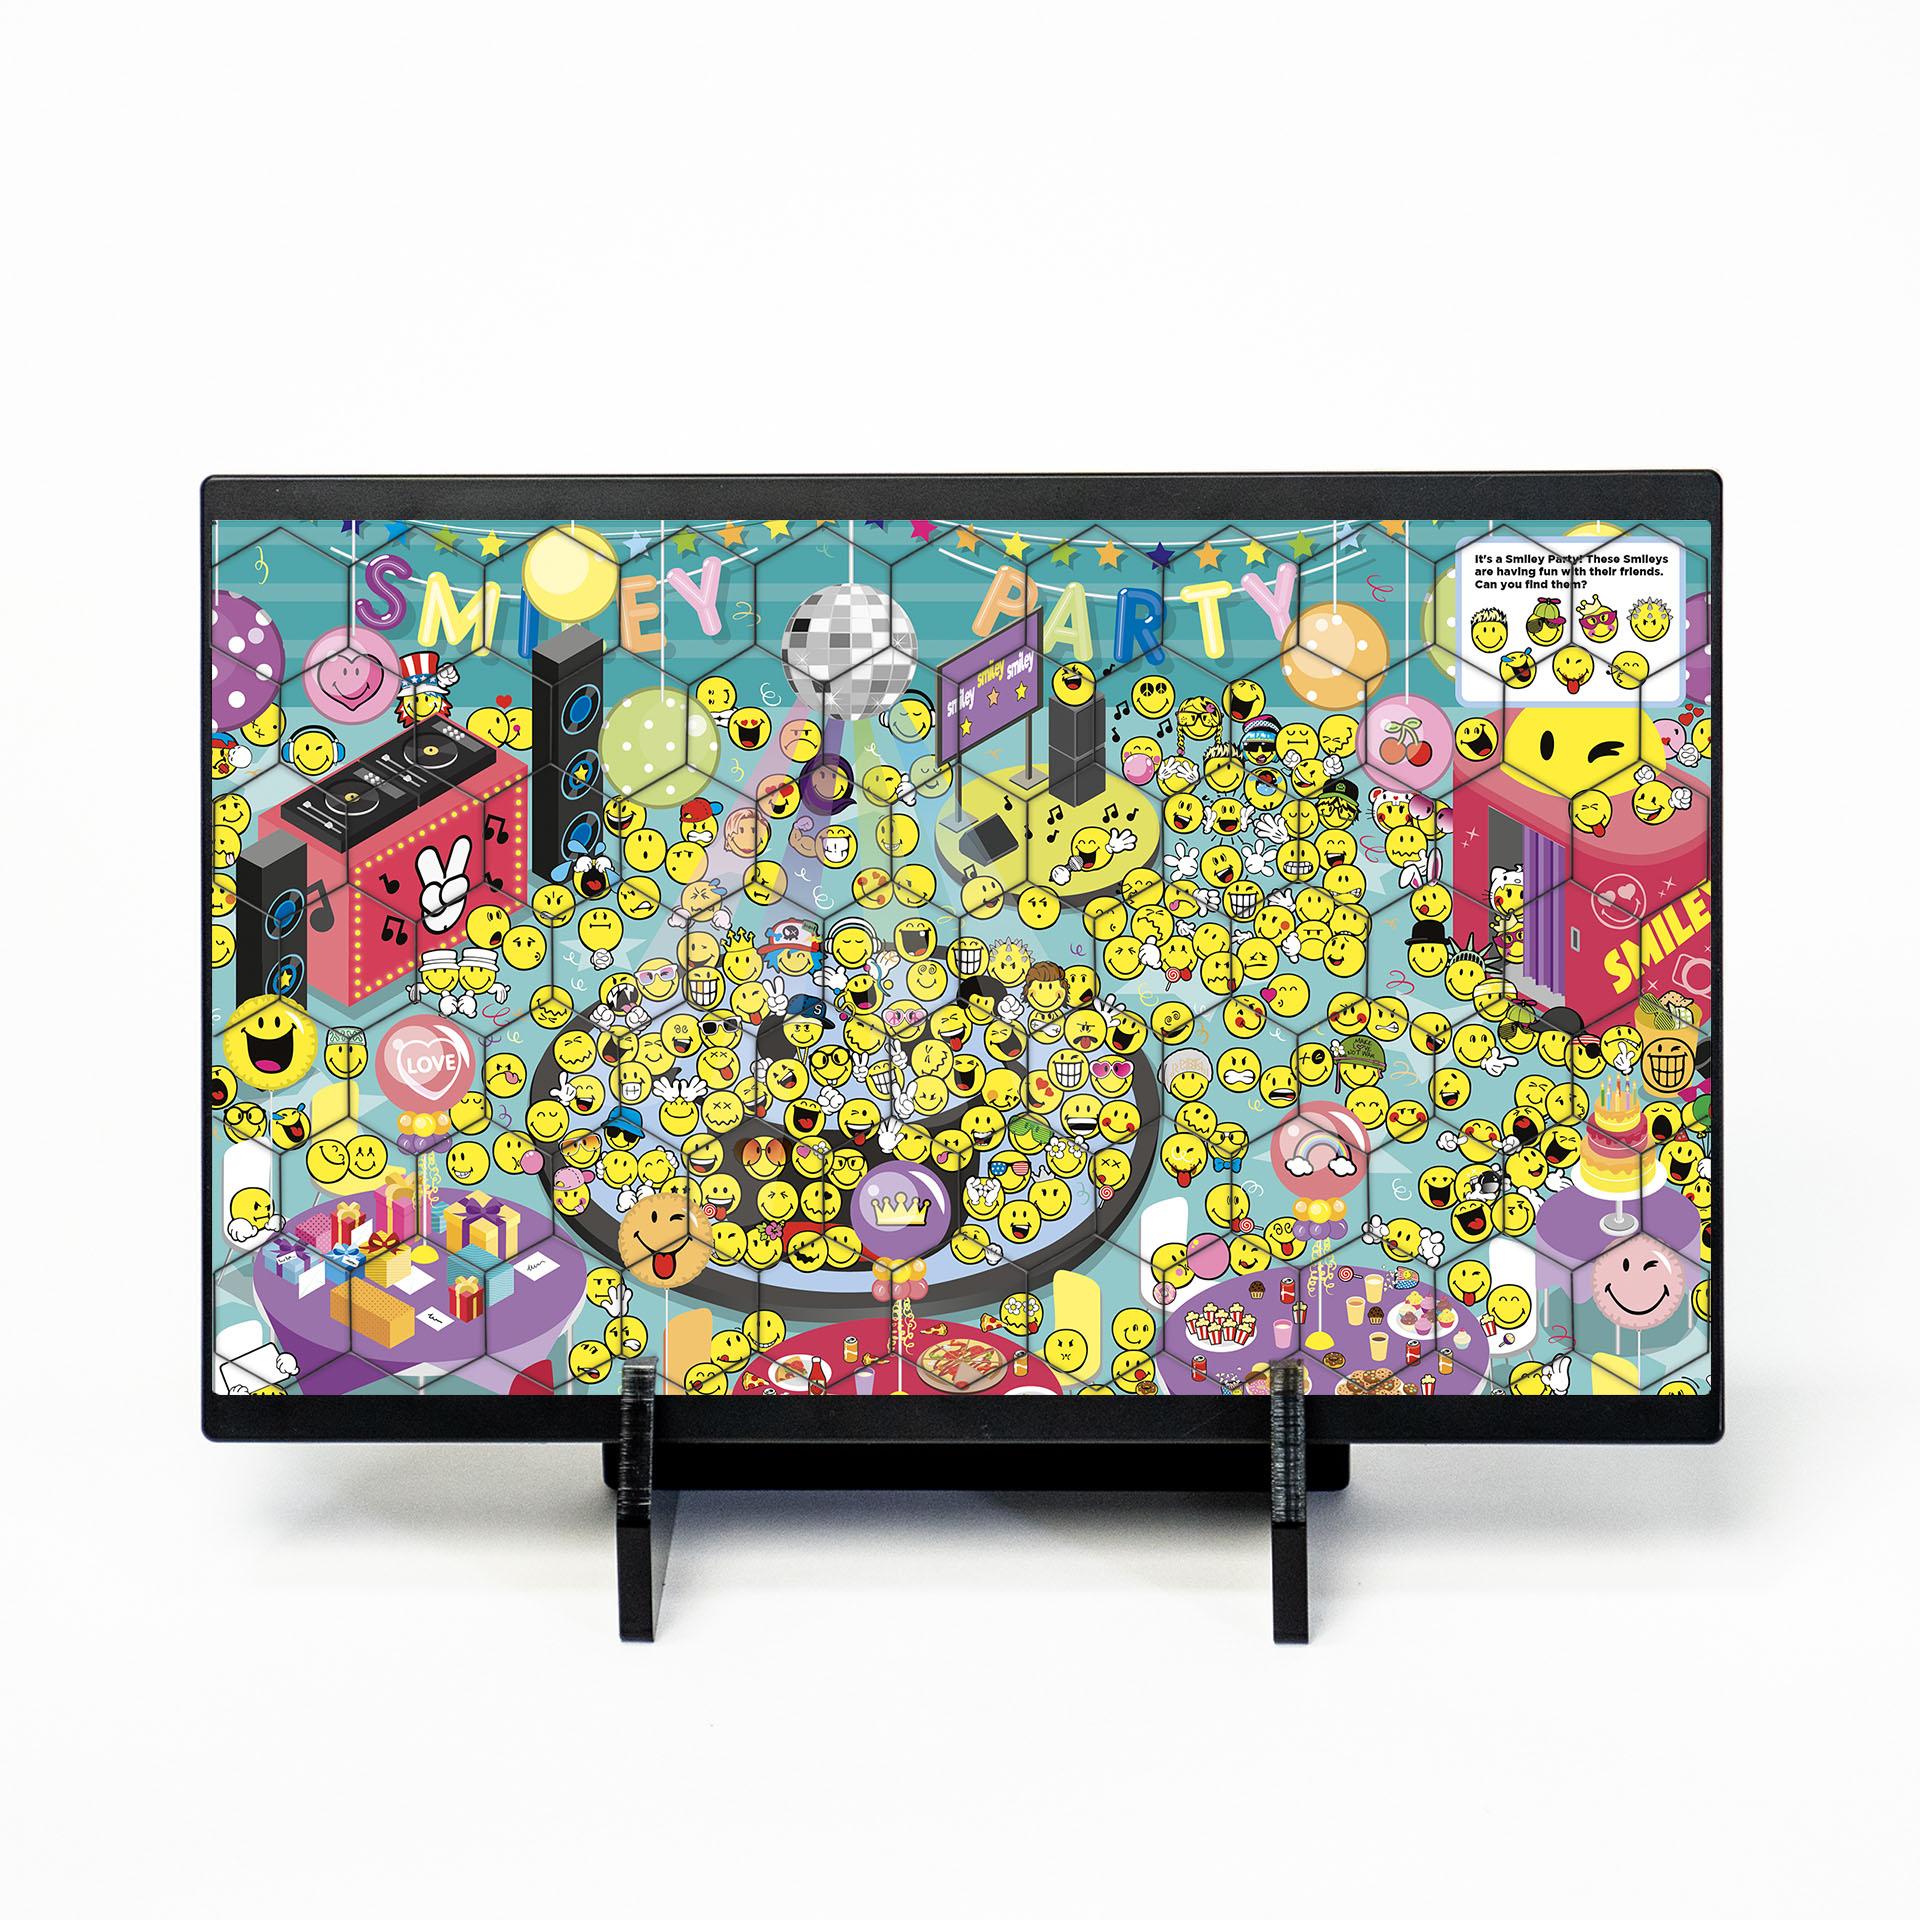 Smiley HEXA 2D Puzzle